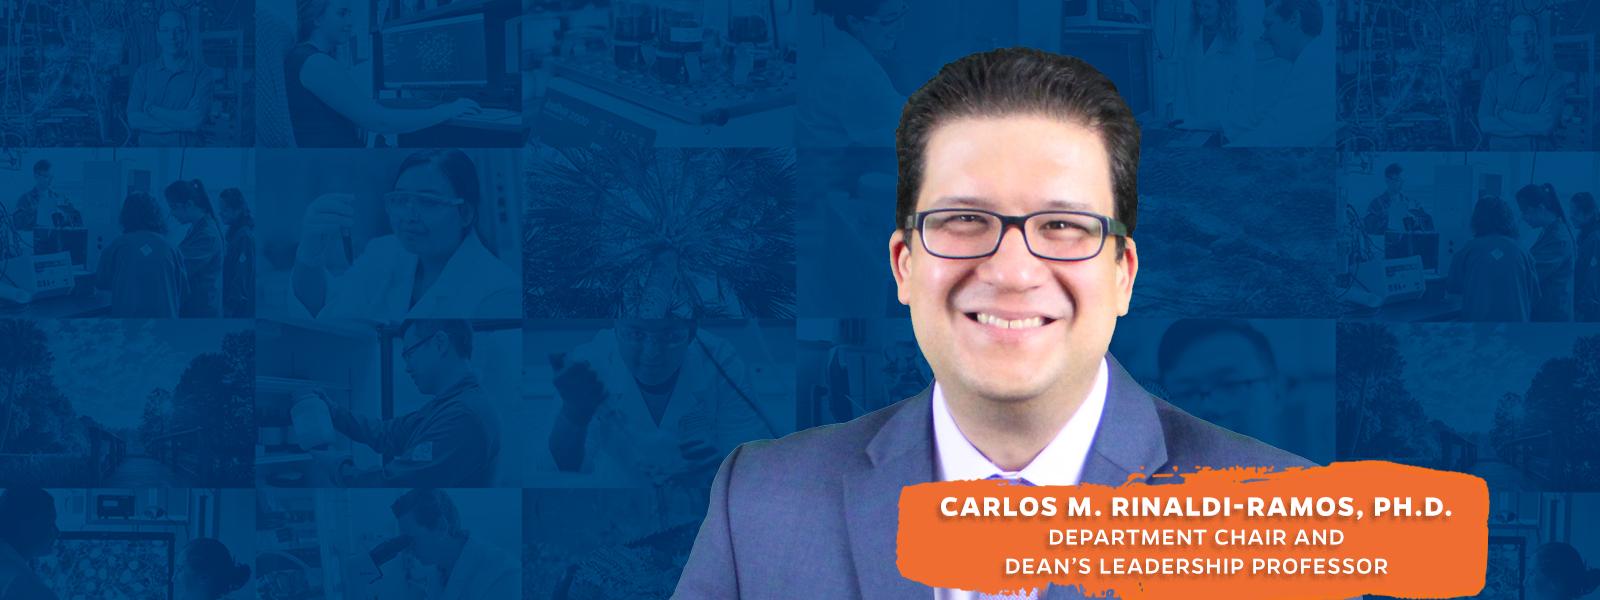 Carlos M. Rinaldi-Ramos, Ph.D.